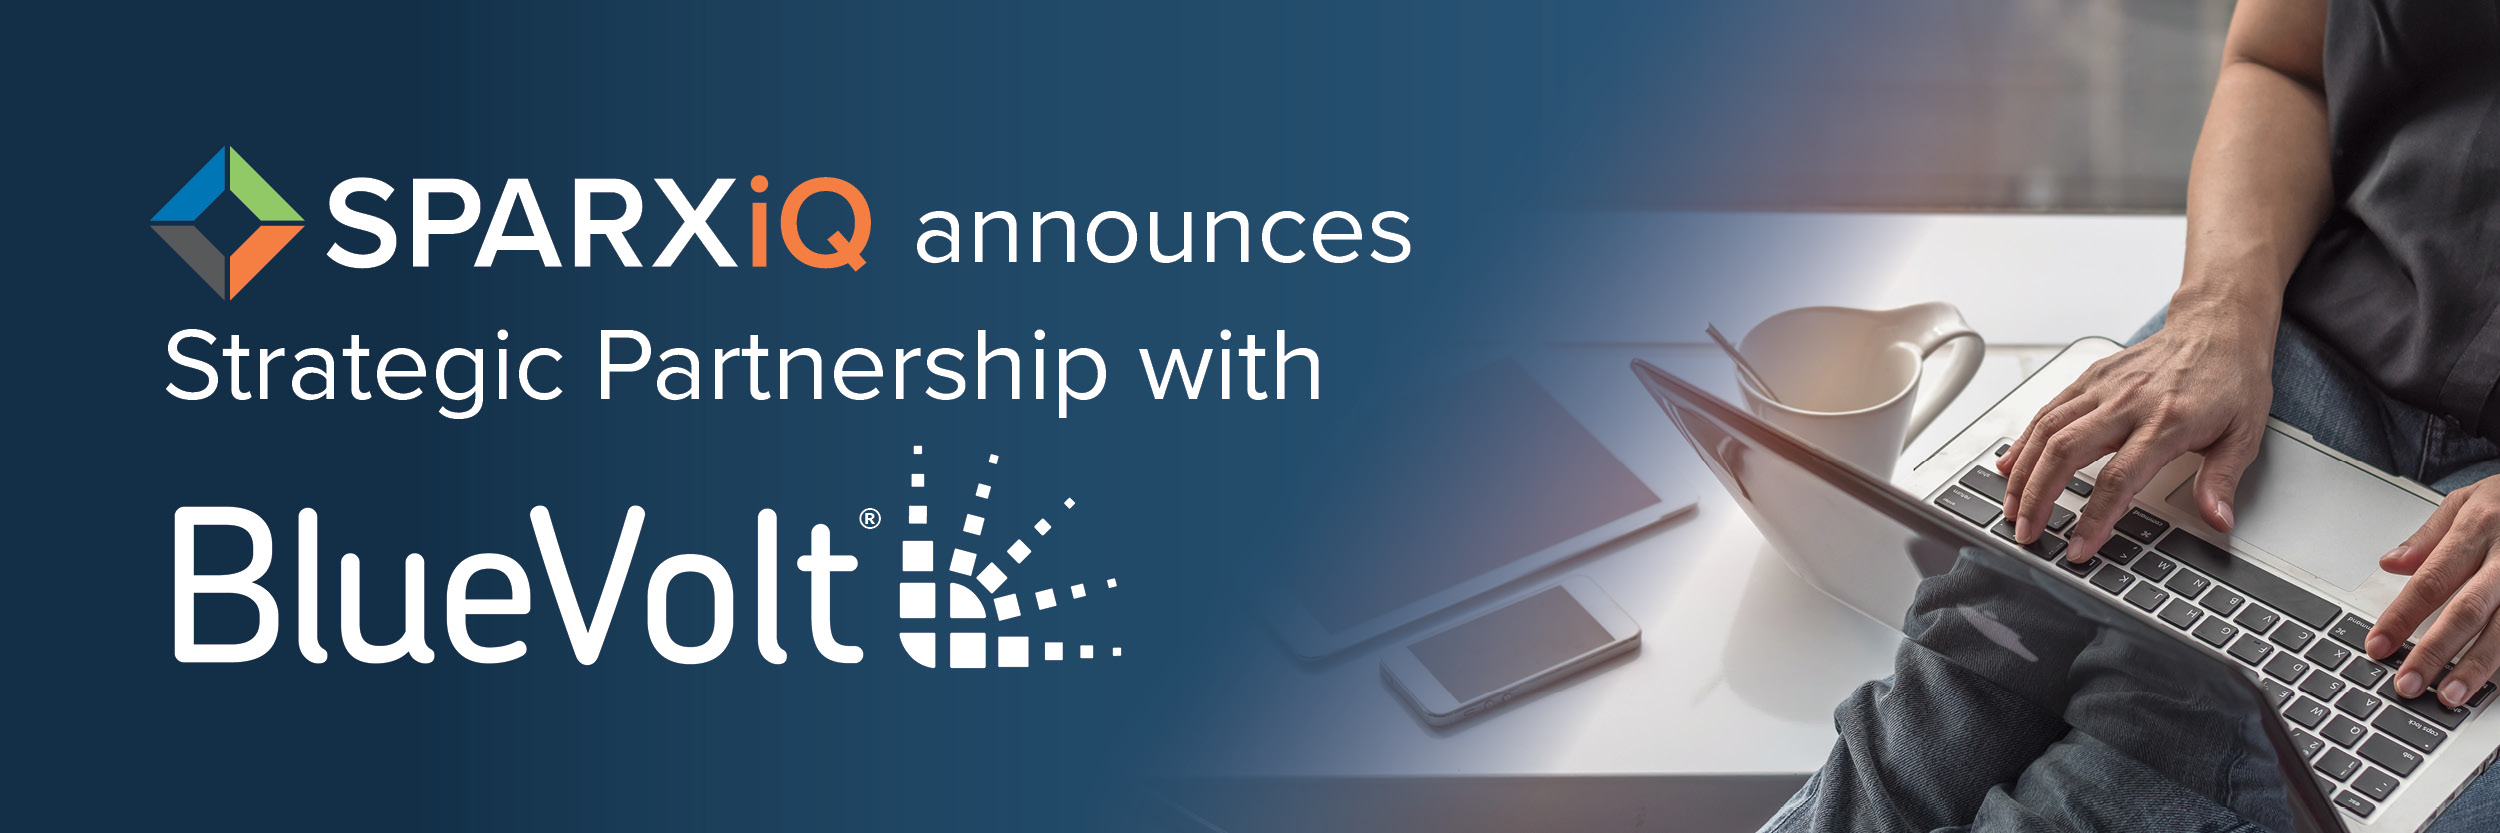 Press Release BlueVolt SPARXiQ Partnership